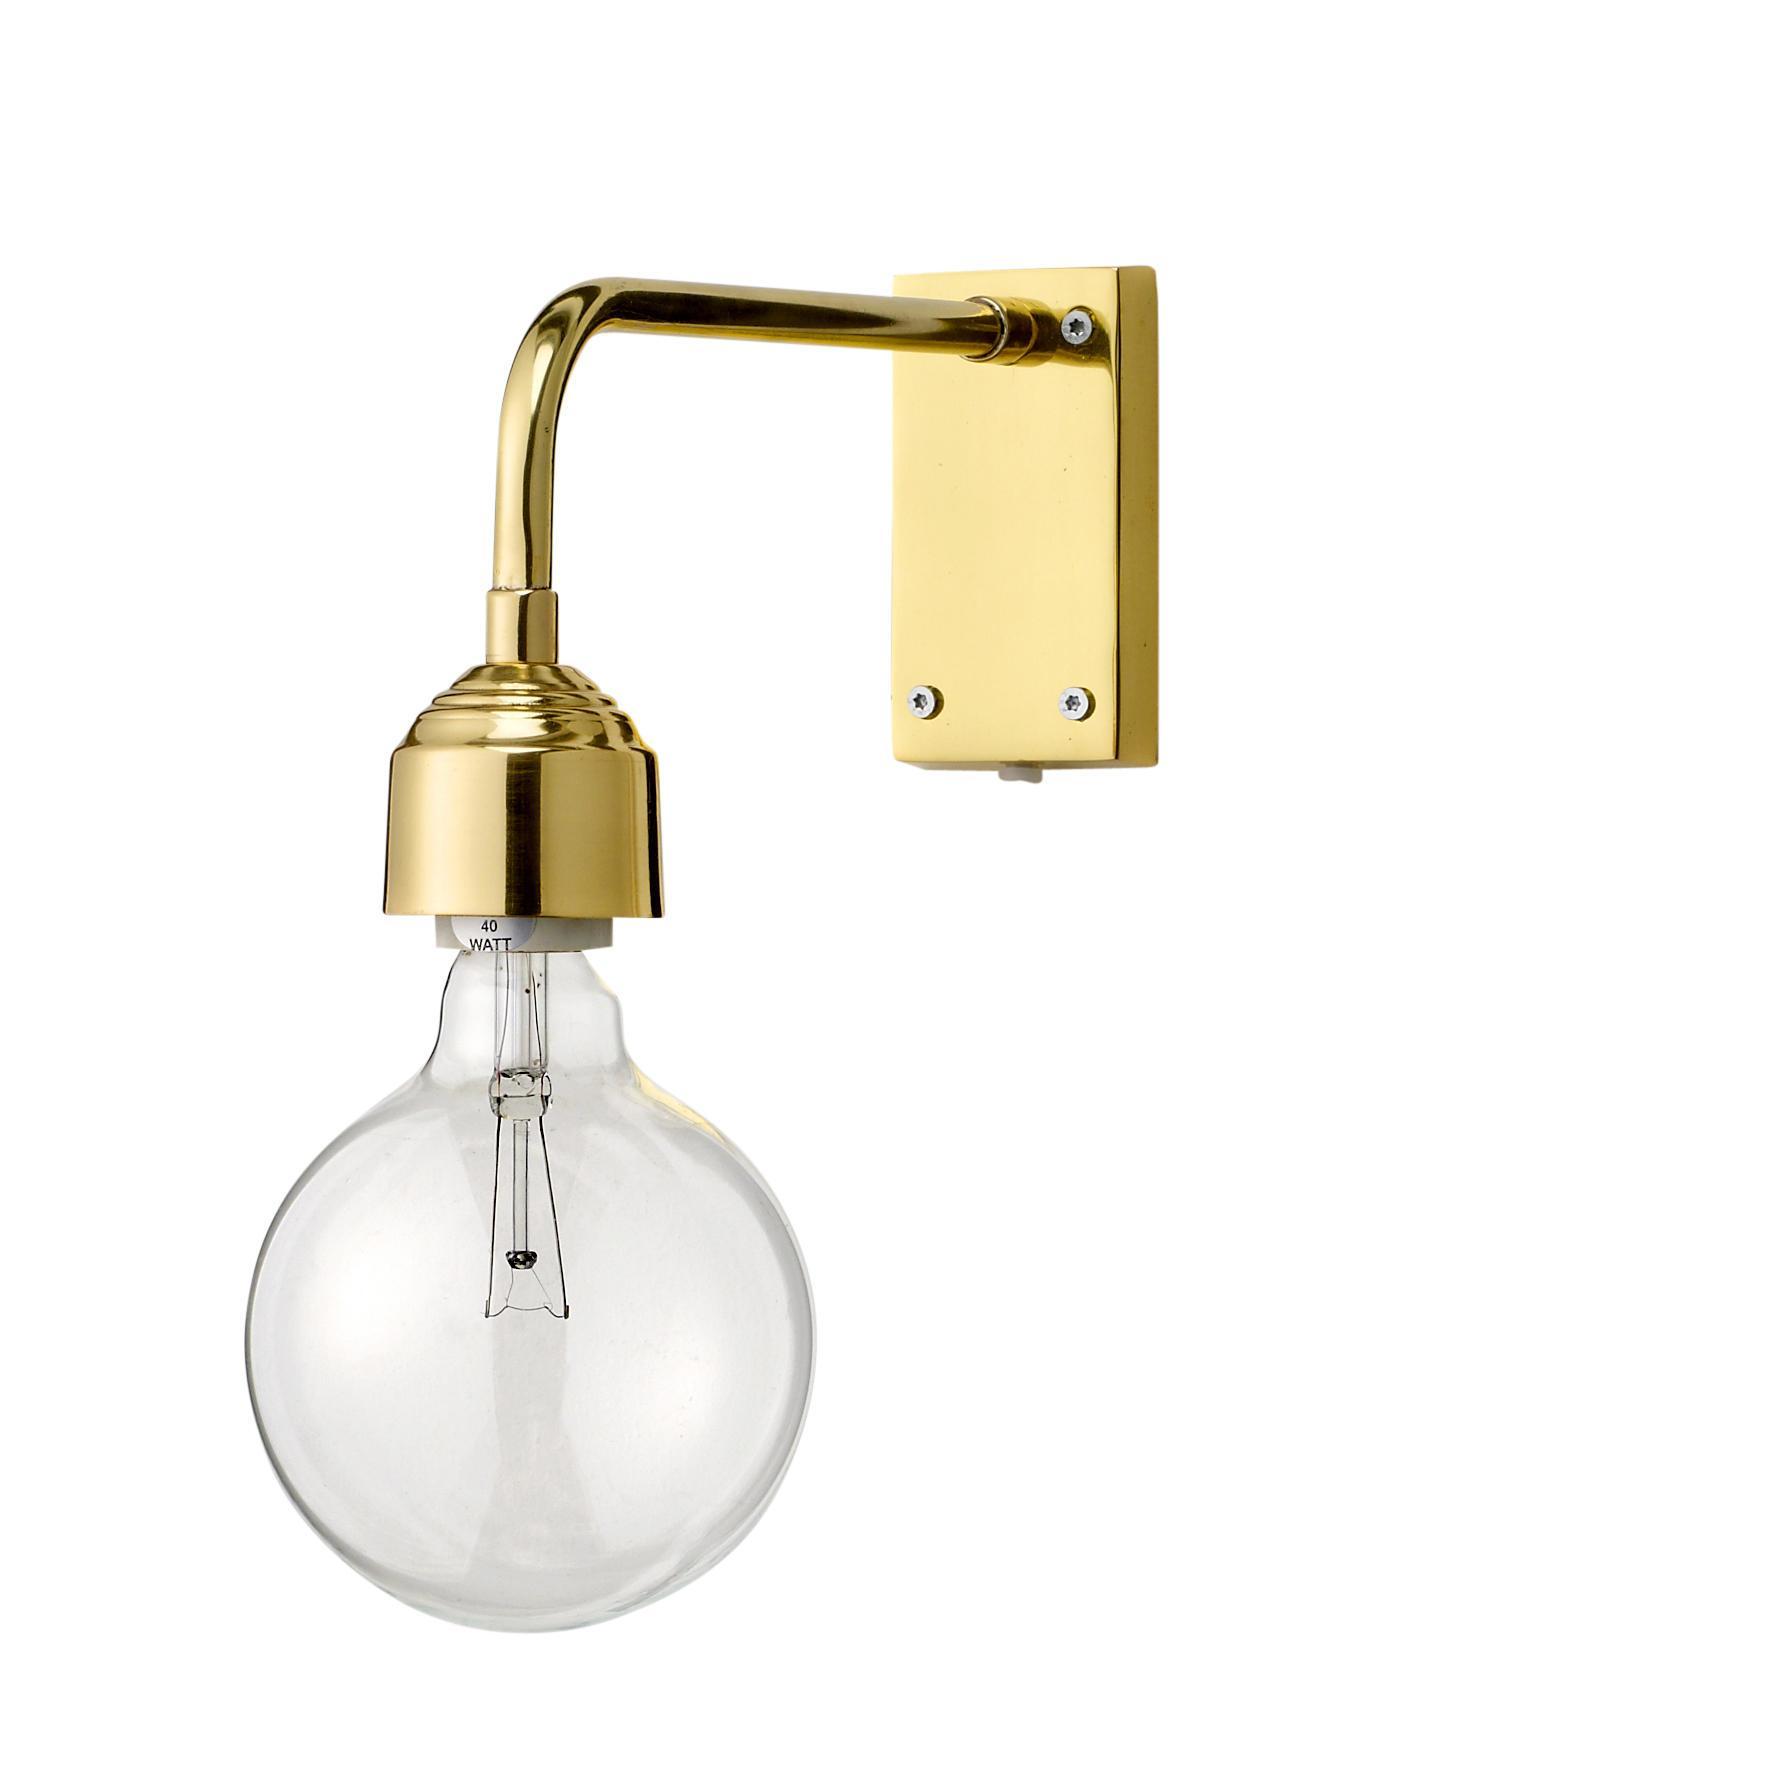 Bloomingville Nástěnná lampička Gold Metal